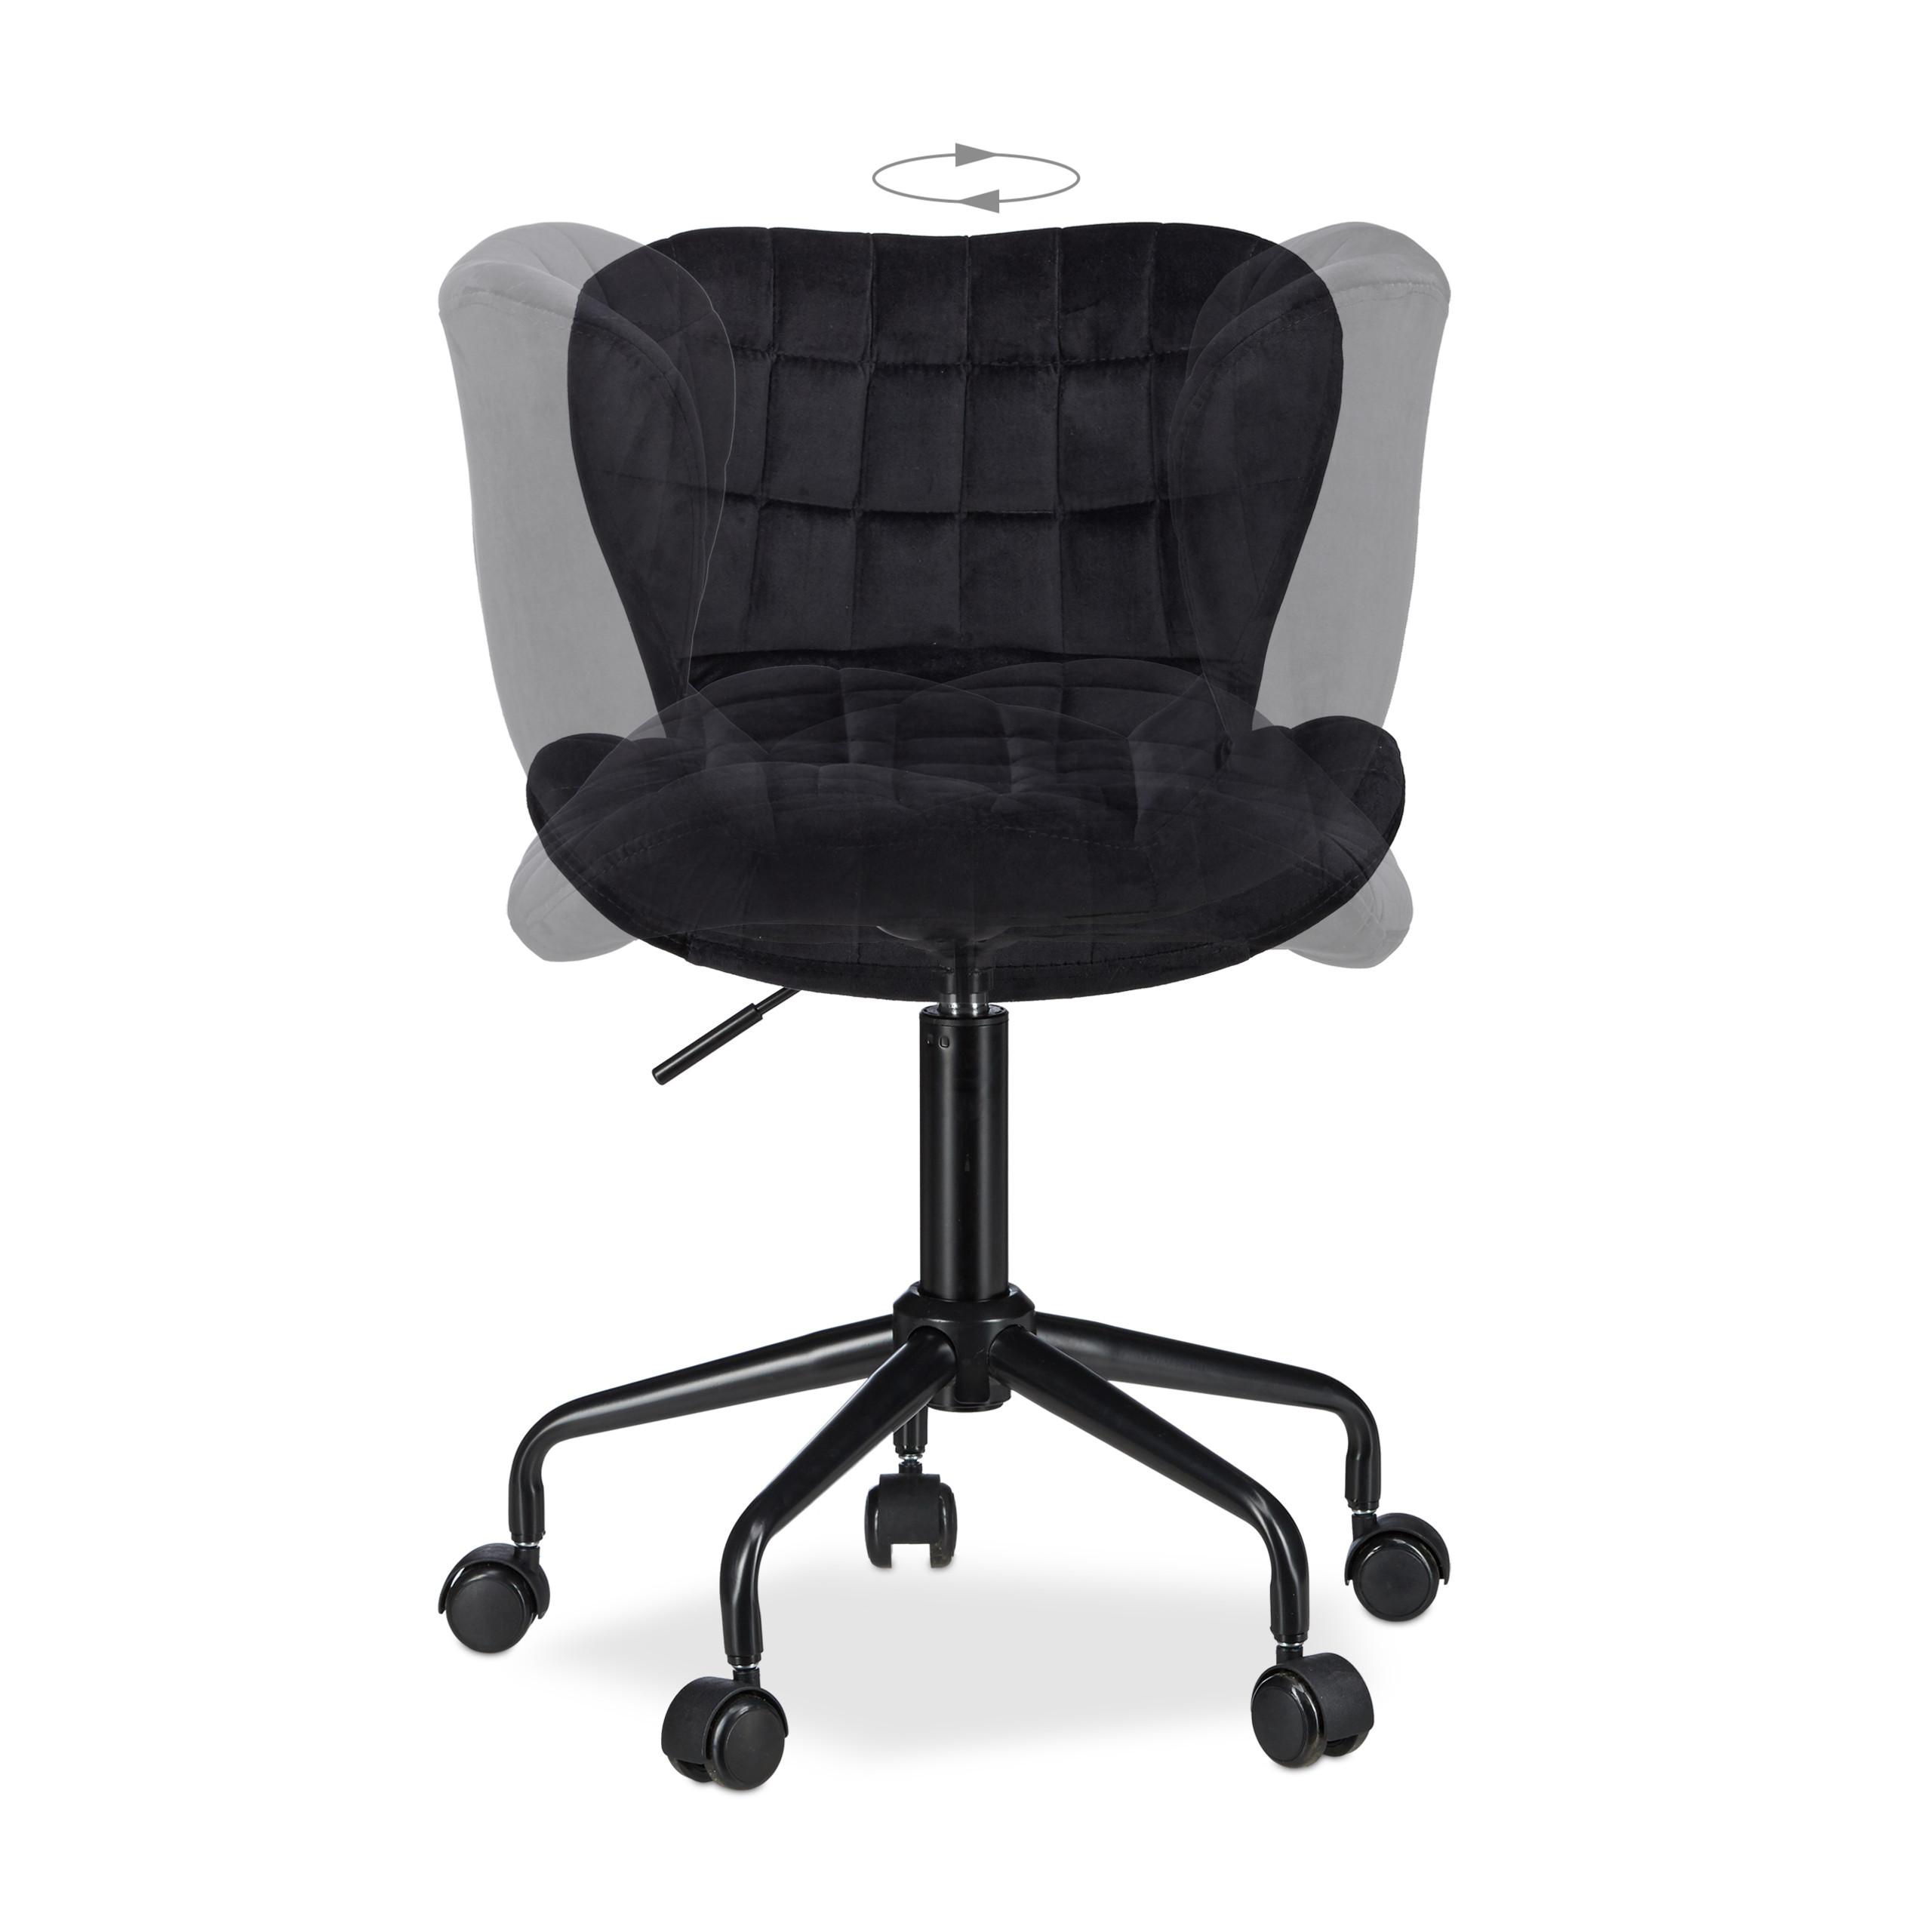 Wondrous Details About Office Desk Chair Ergonomic Swivel Executive Chair With Wheels Comfortable Unemploymentrelief Wooden Chair Designs For Living Room Unemploymentrelieforg